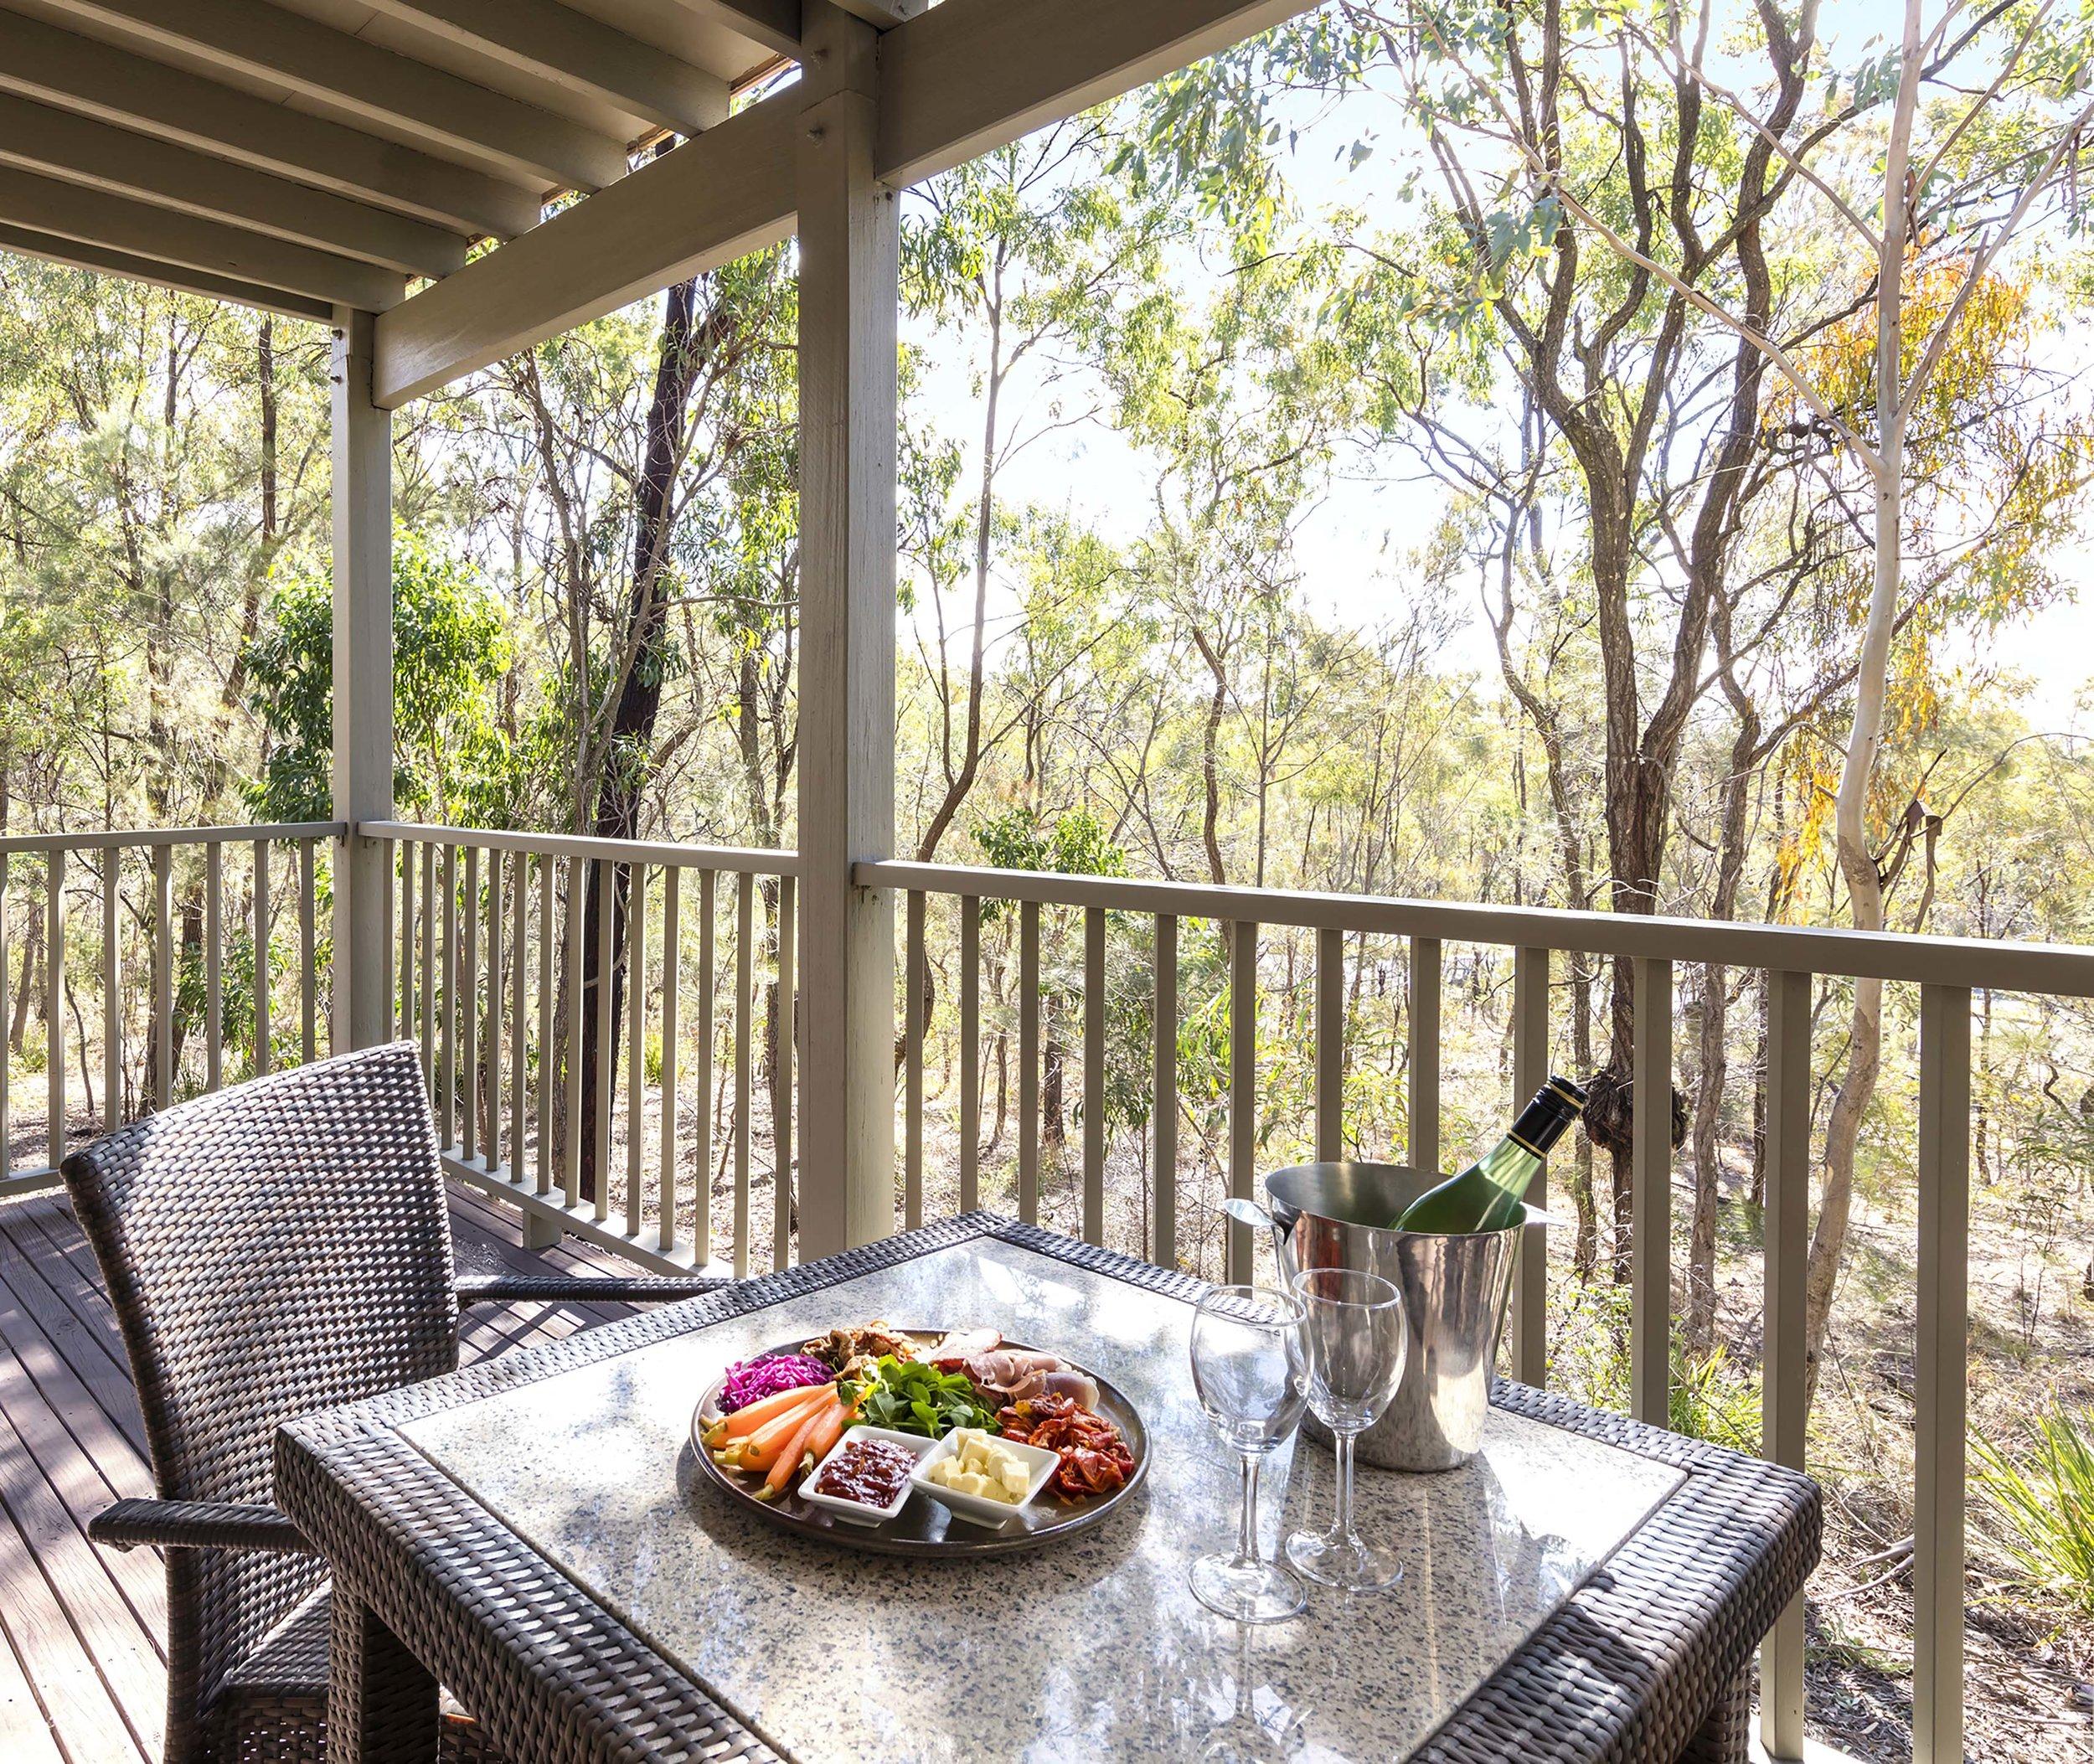 88017575-H1-Oaks_Cypress_Lakes_Resort_1_Bedroom_Premier_Villa.jpg